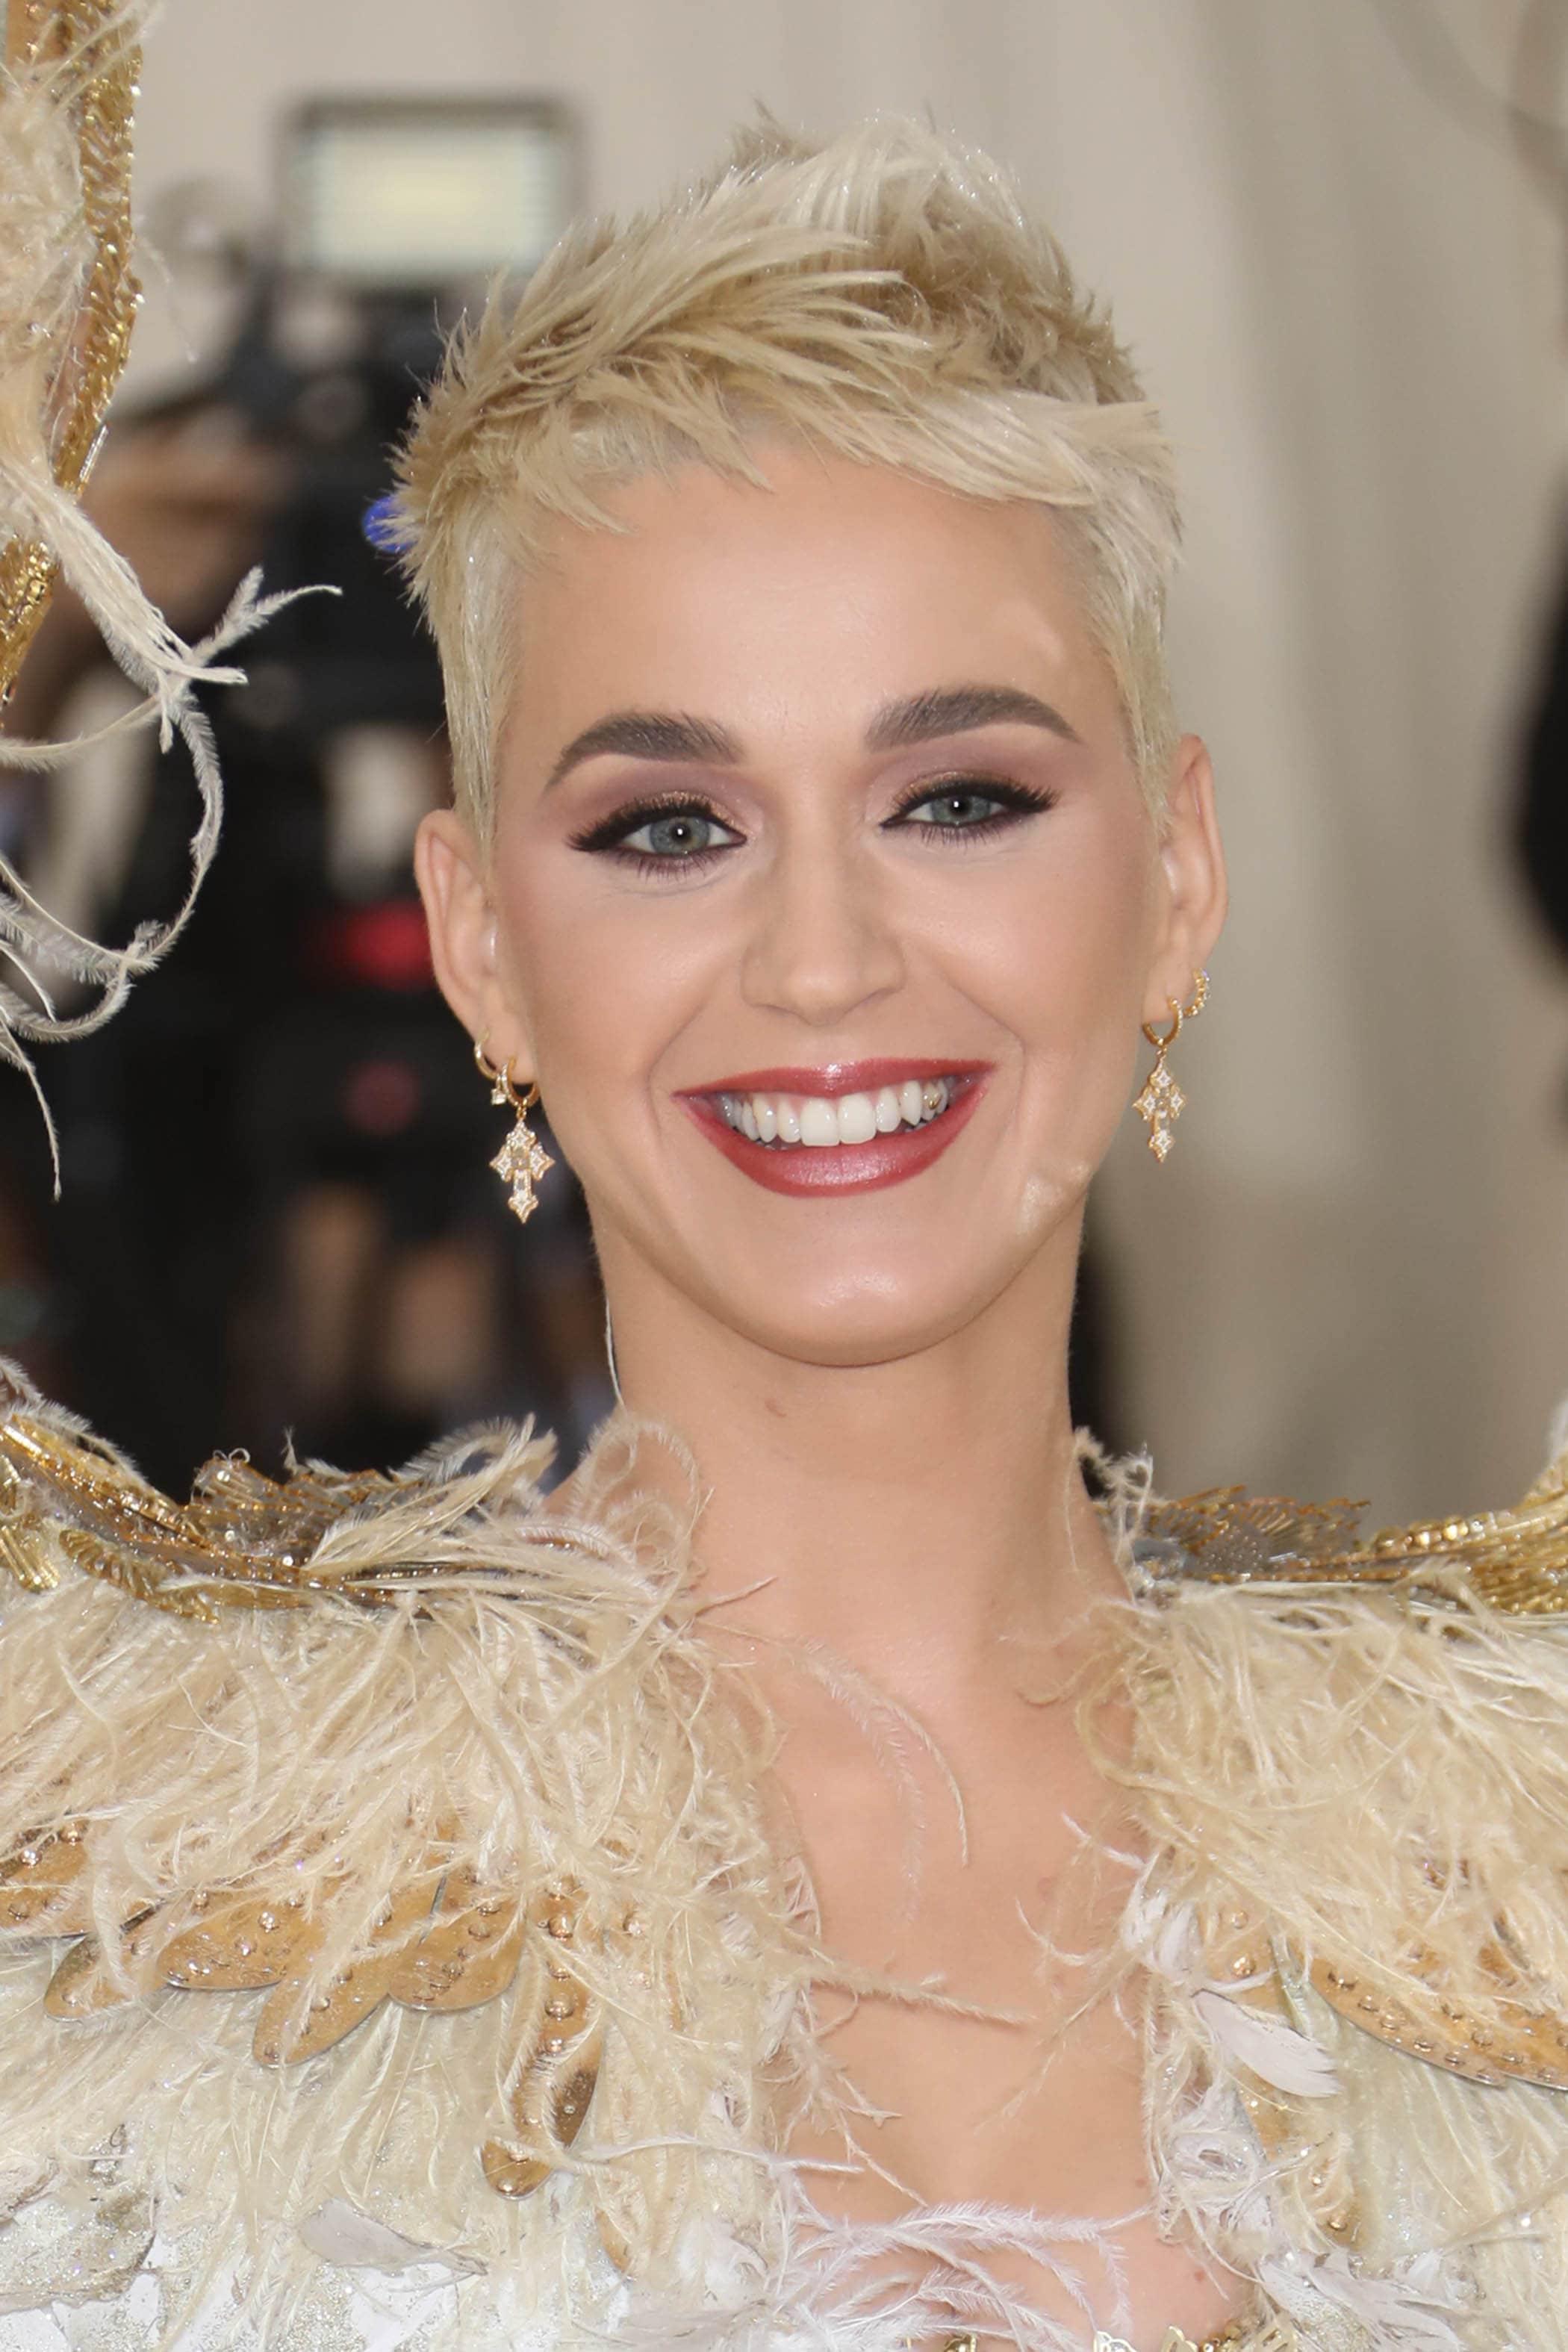 Katy Perry con cabello rubio platinado super corto